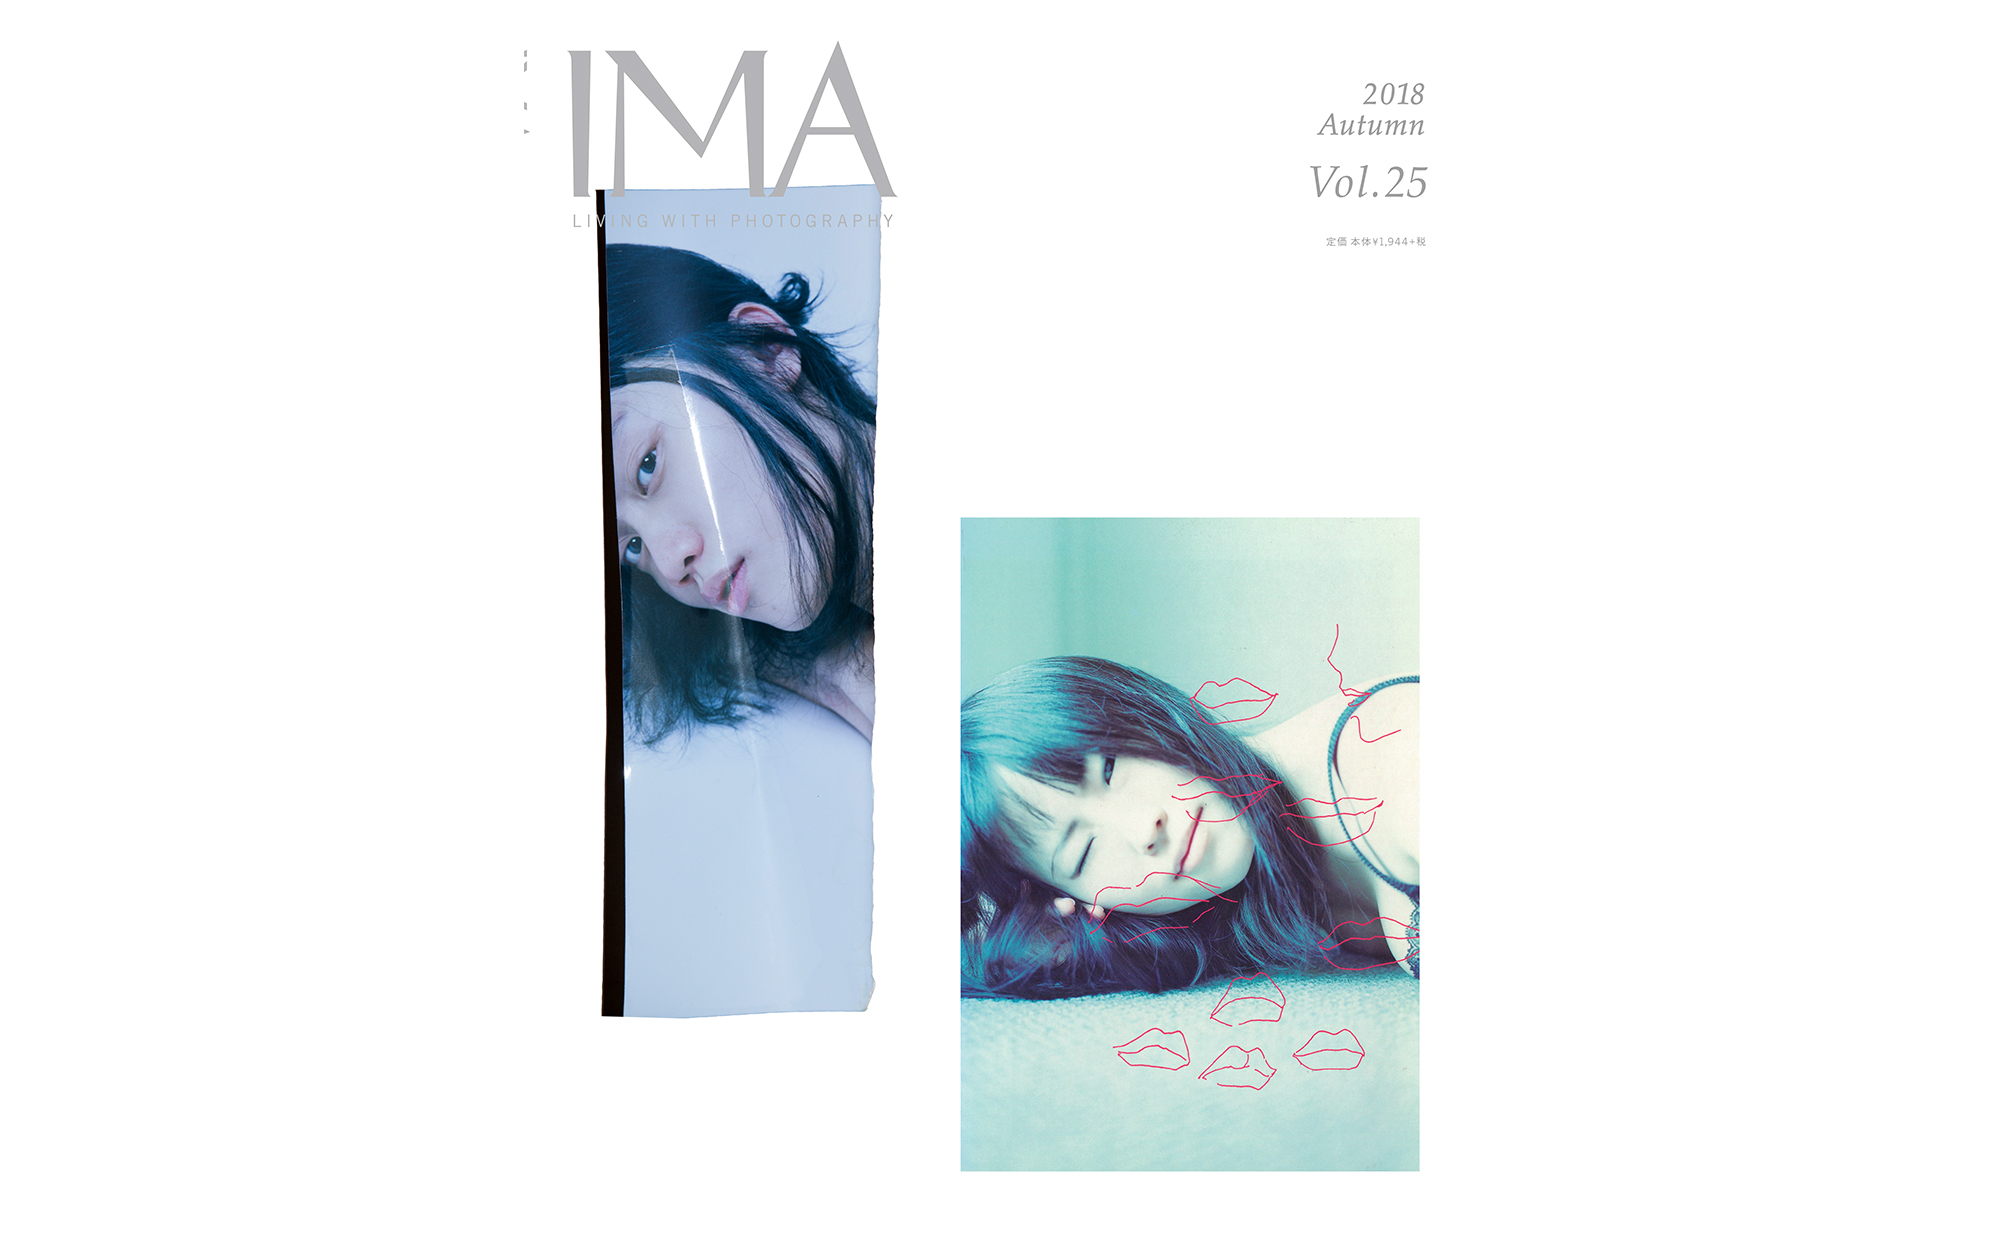 IMA 2018 Autumn Vol.25 © Mayumi Hosokura © HIROMIX